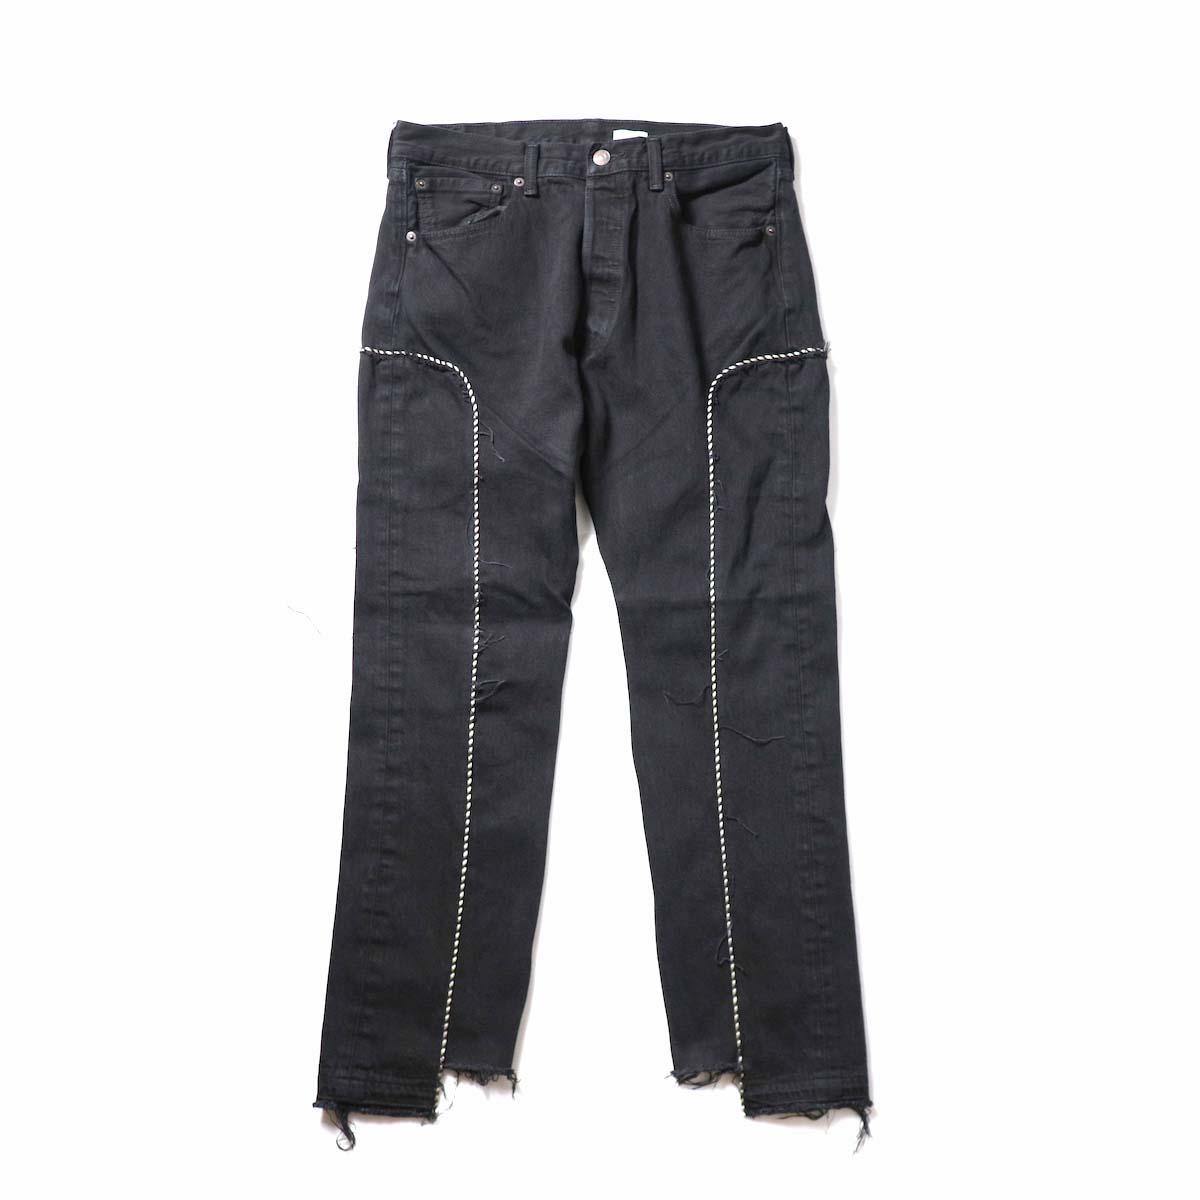 OLD PARK / Western Jeans Black (Lsize-A)